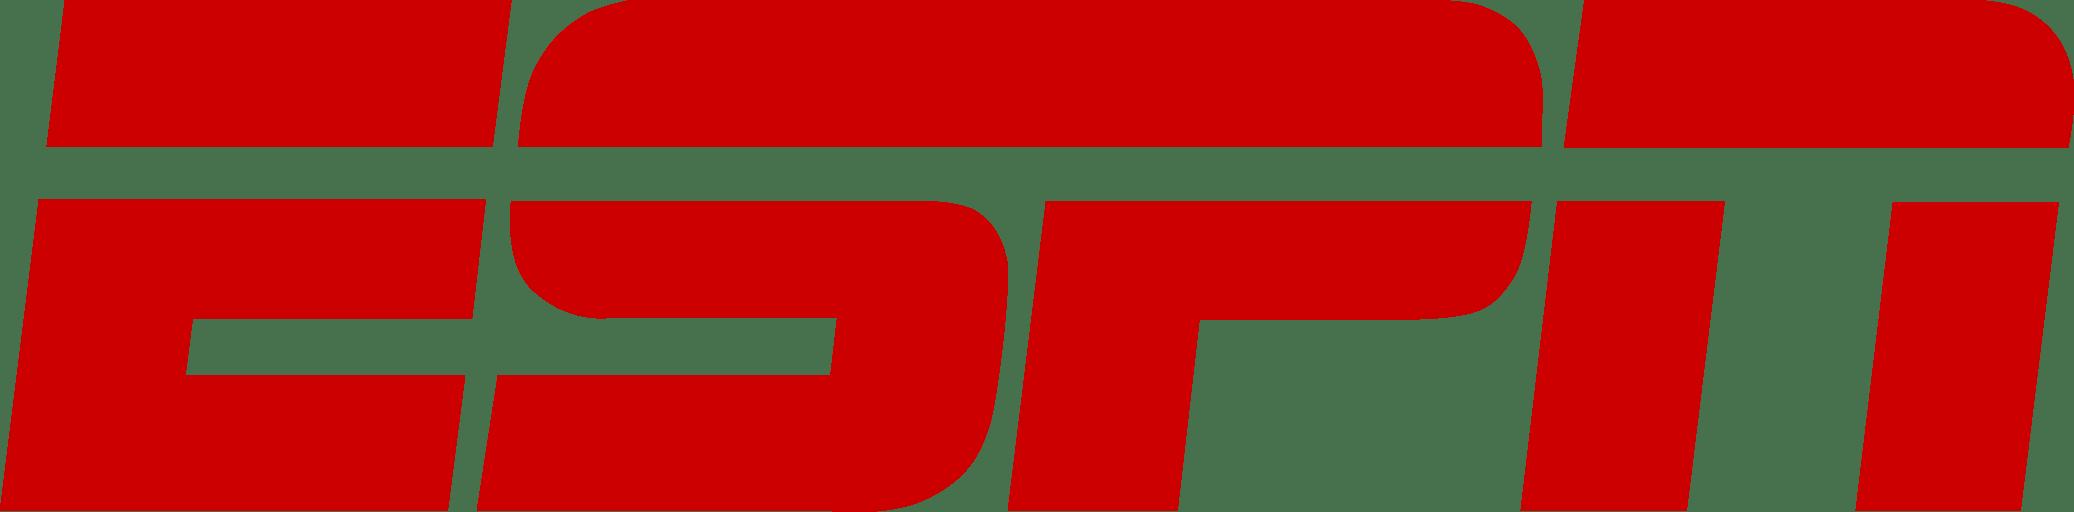 Espn Logo transparent PNG.